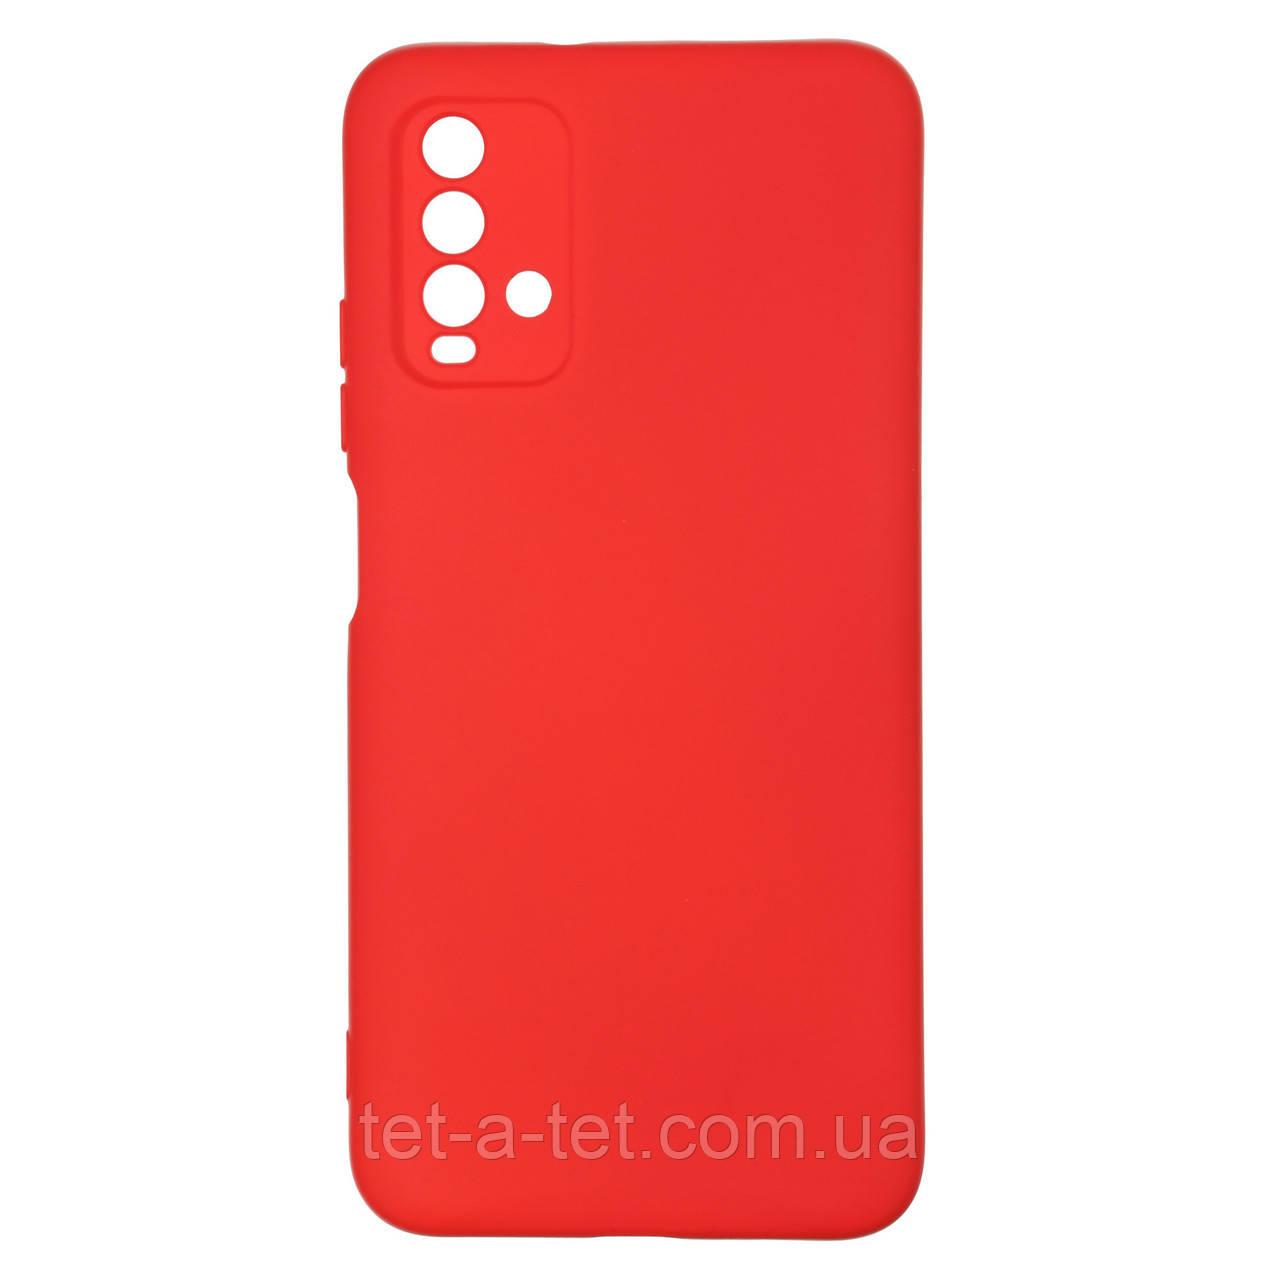 Чохол силіконовий ArmorStandart ICON Case for Xiaomi Redmi 9T Red Chili